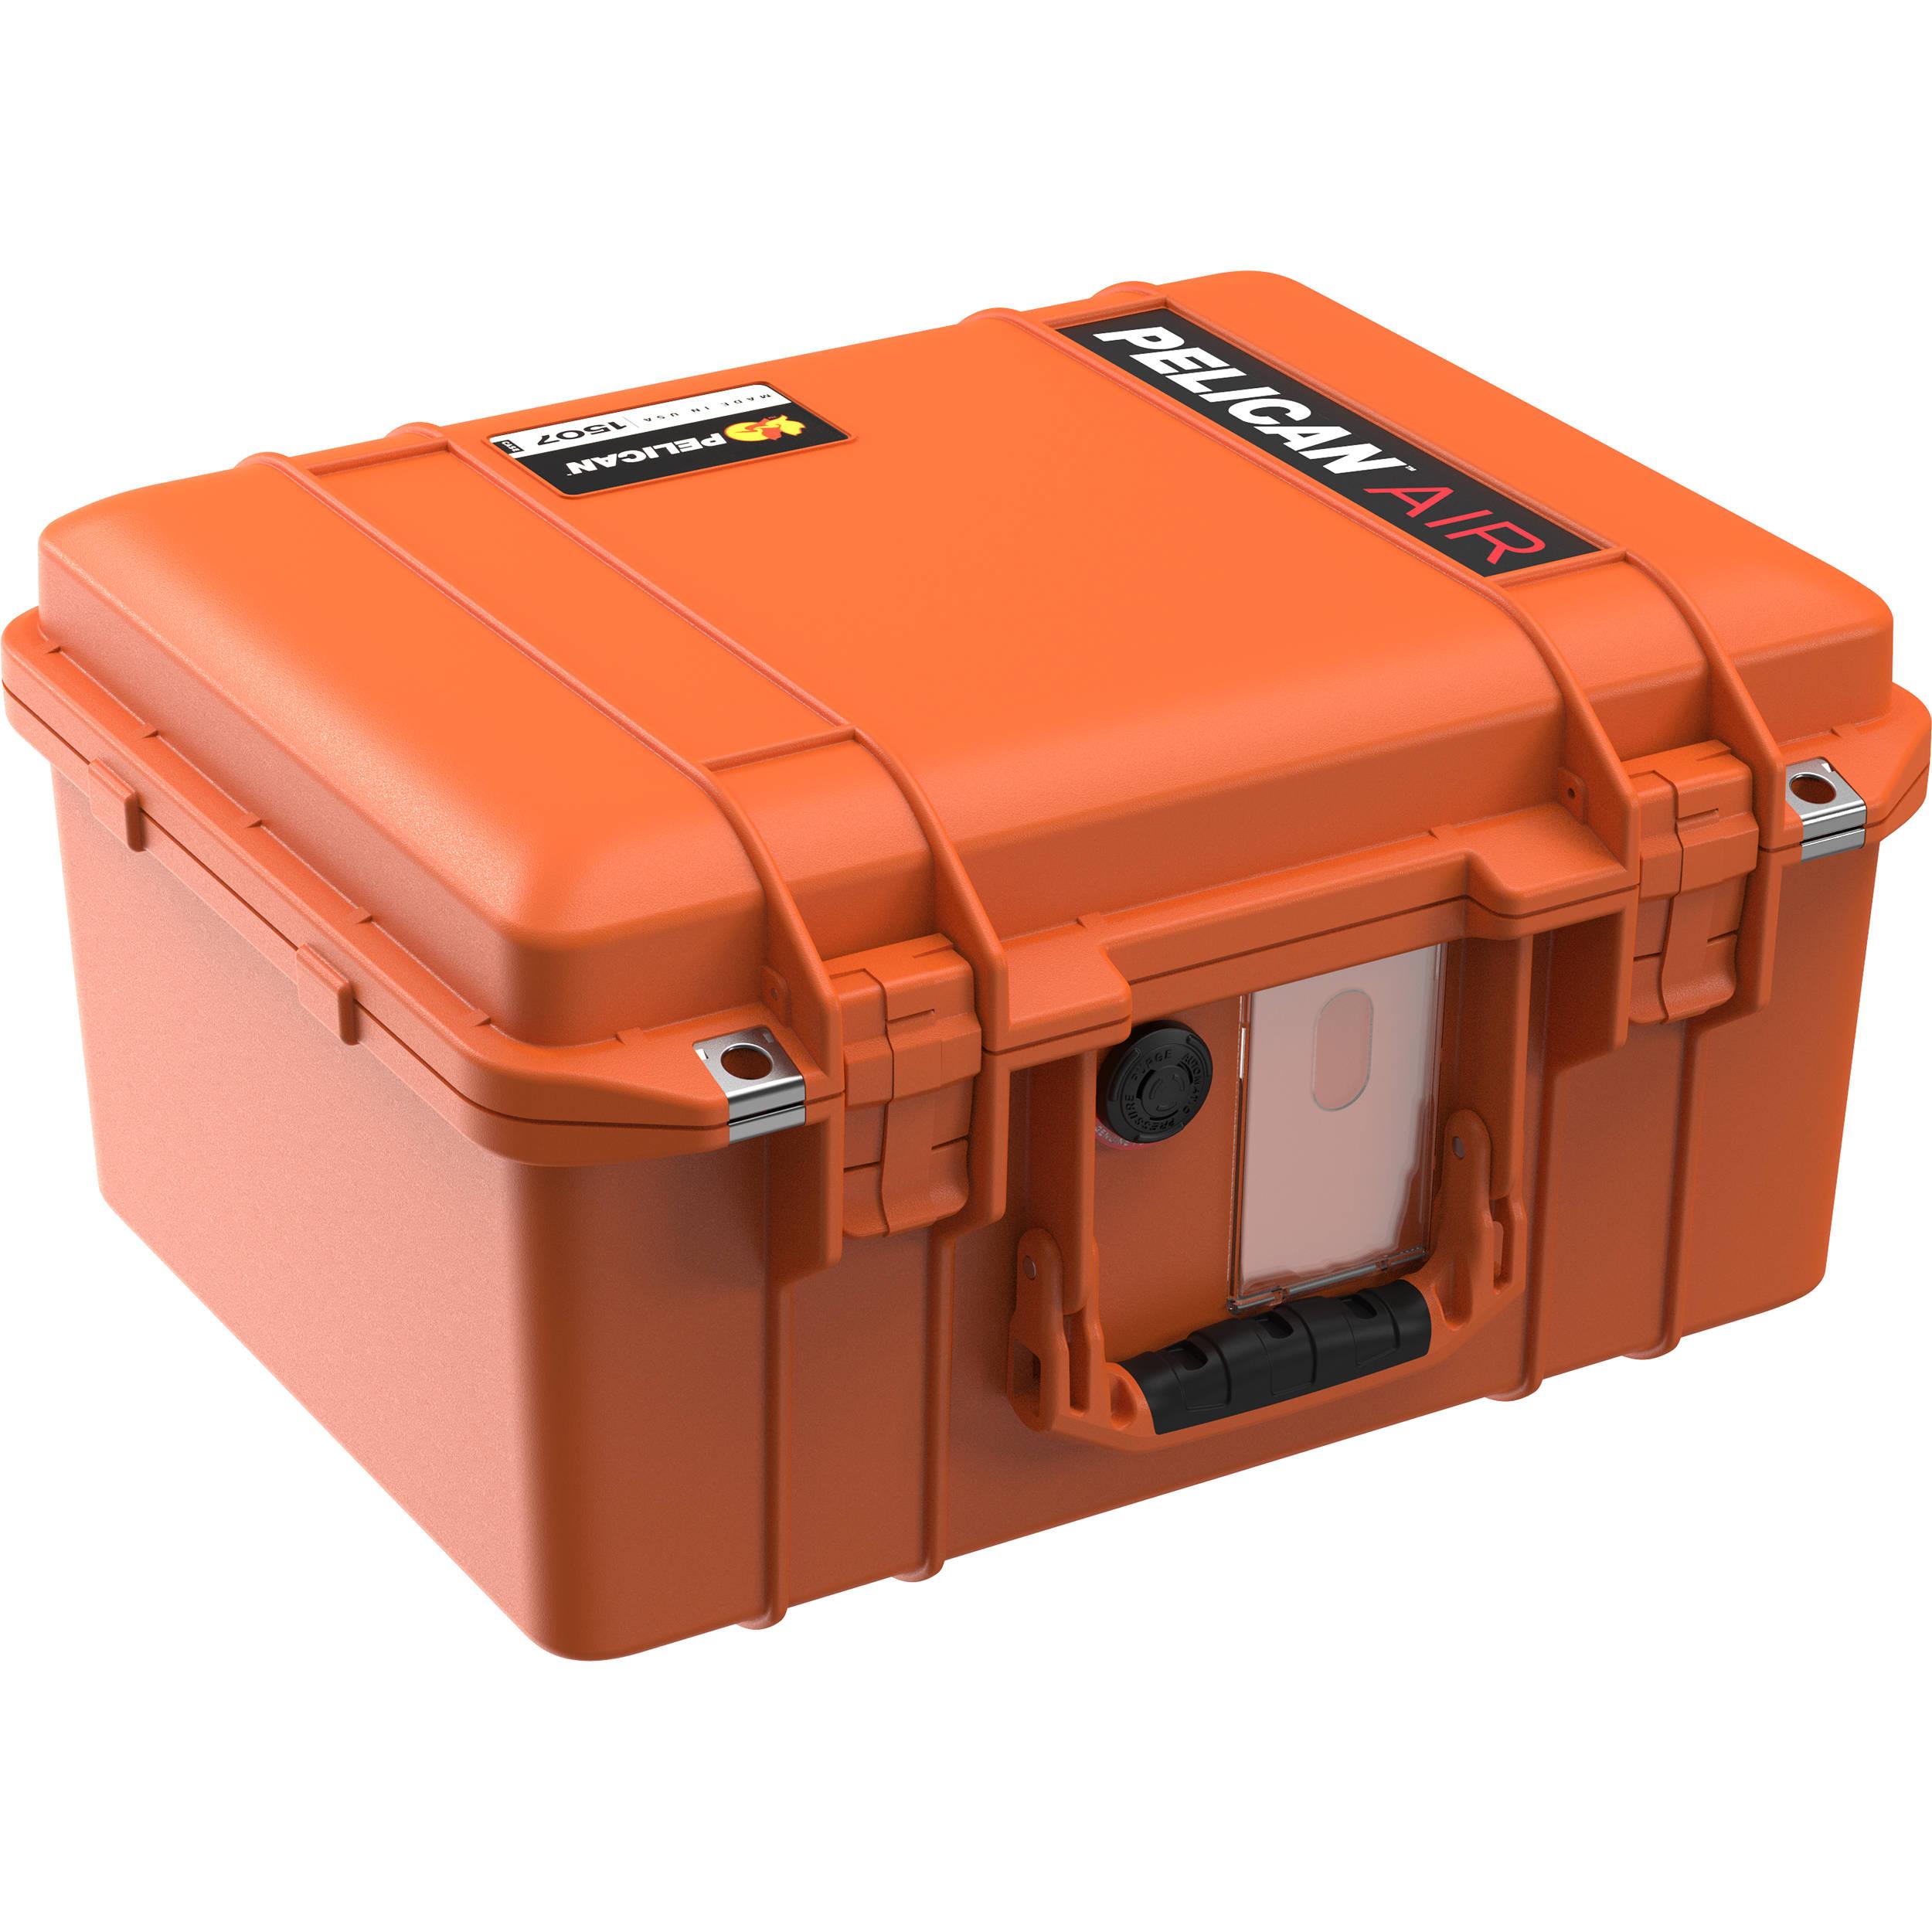 Orange Pelican Air 1507 Case No Foam